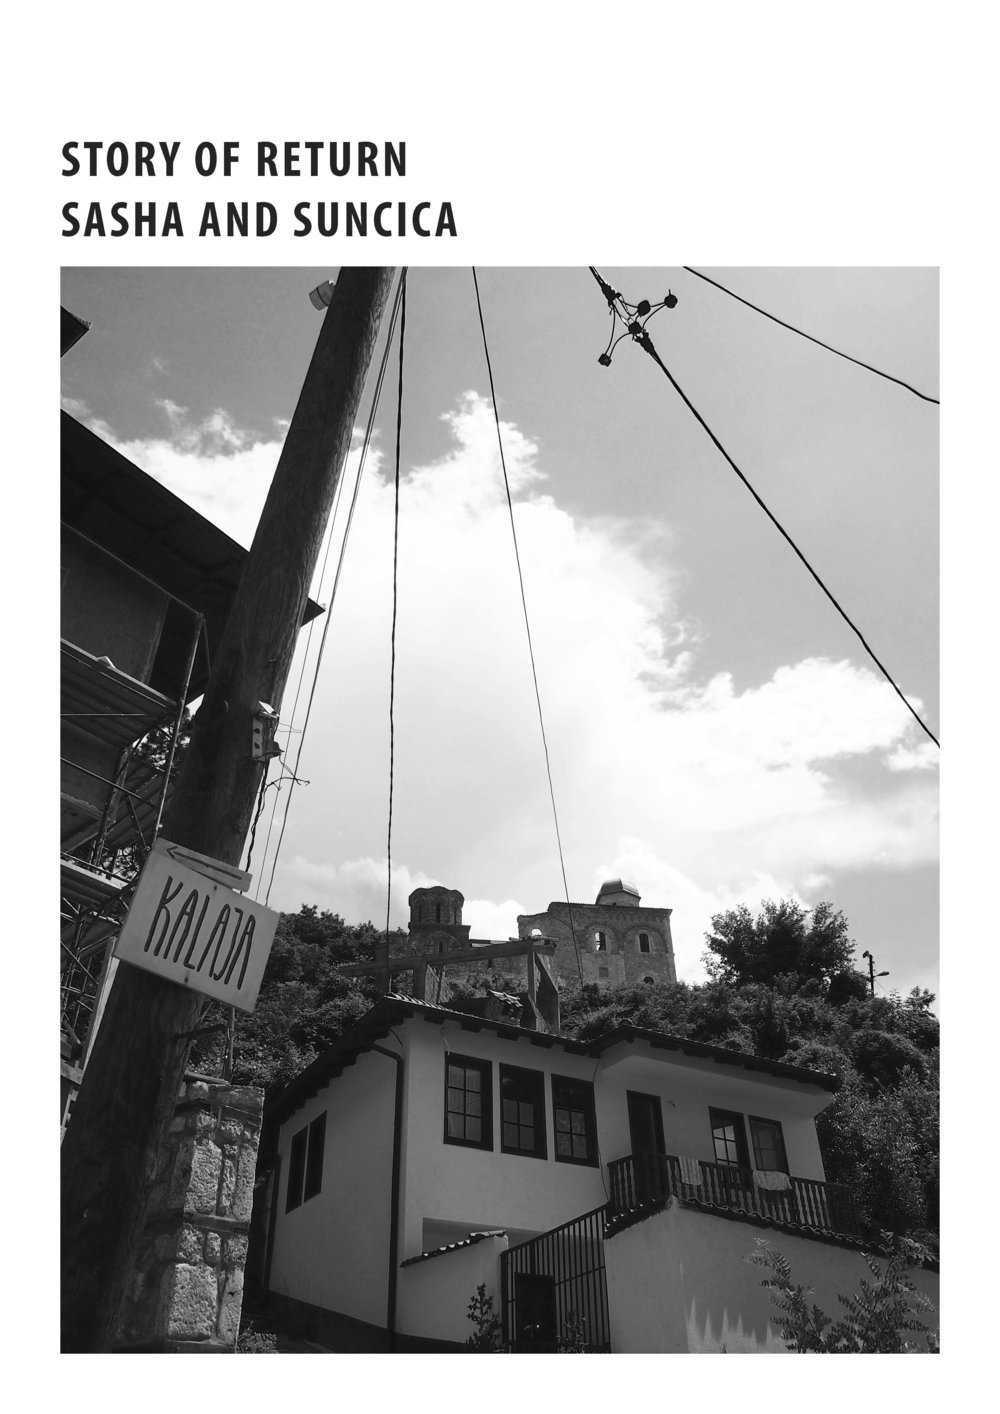 Prizren story_Sasha and Suncica_Page_1.jpg